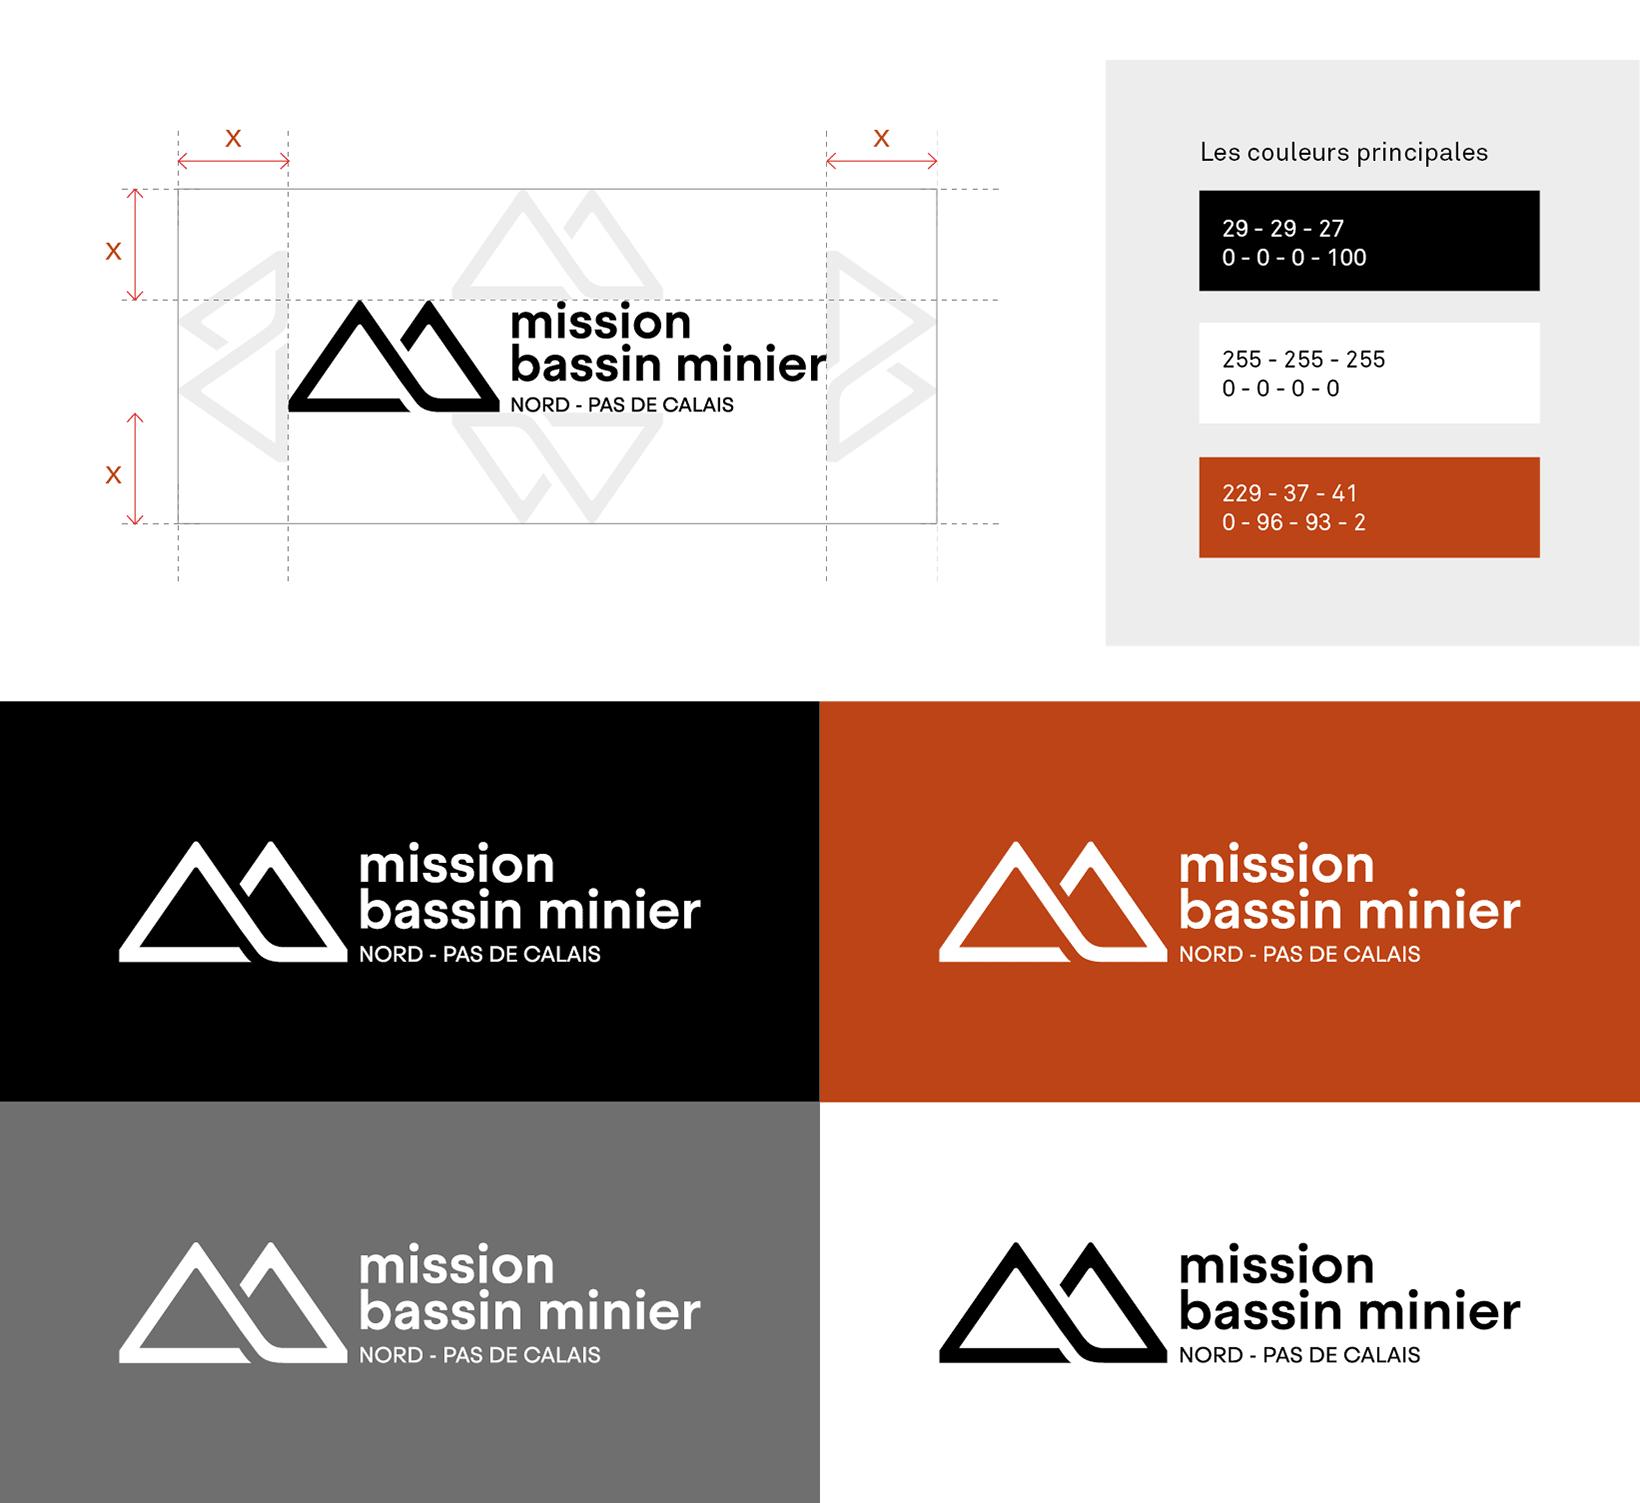 MissionBassinMinier-03